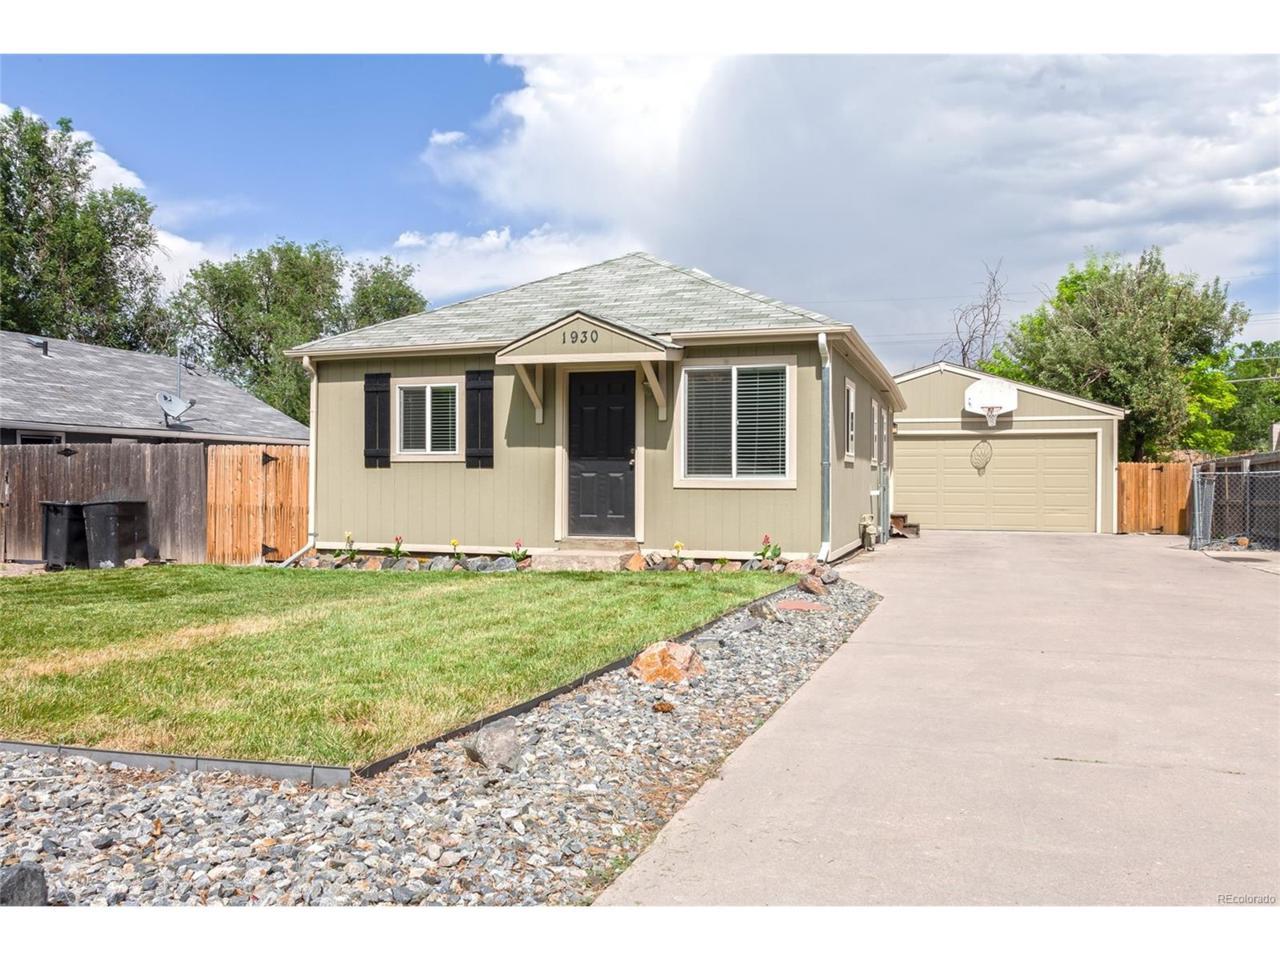 1930 Kendall Street, Lakewood, CO 80214 (MLS #4892371) :: 8z Real Estate